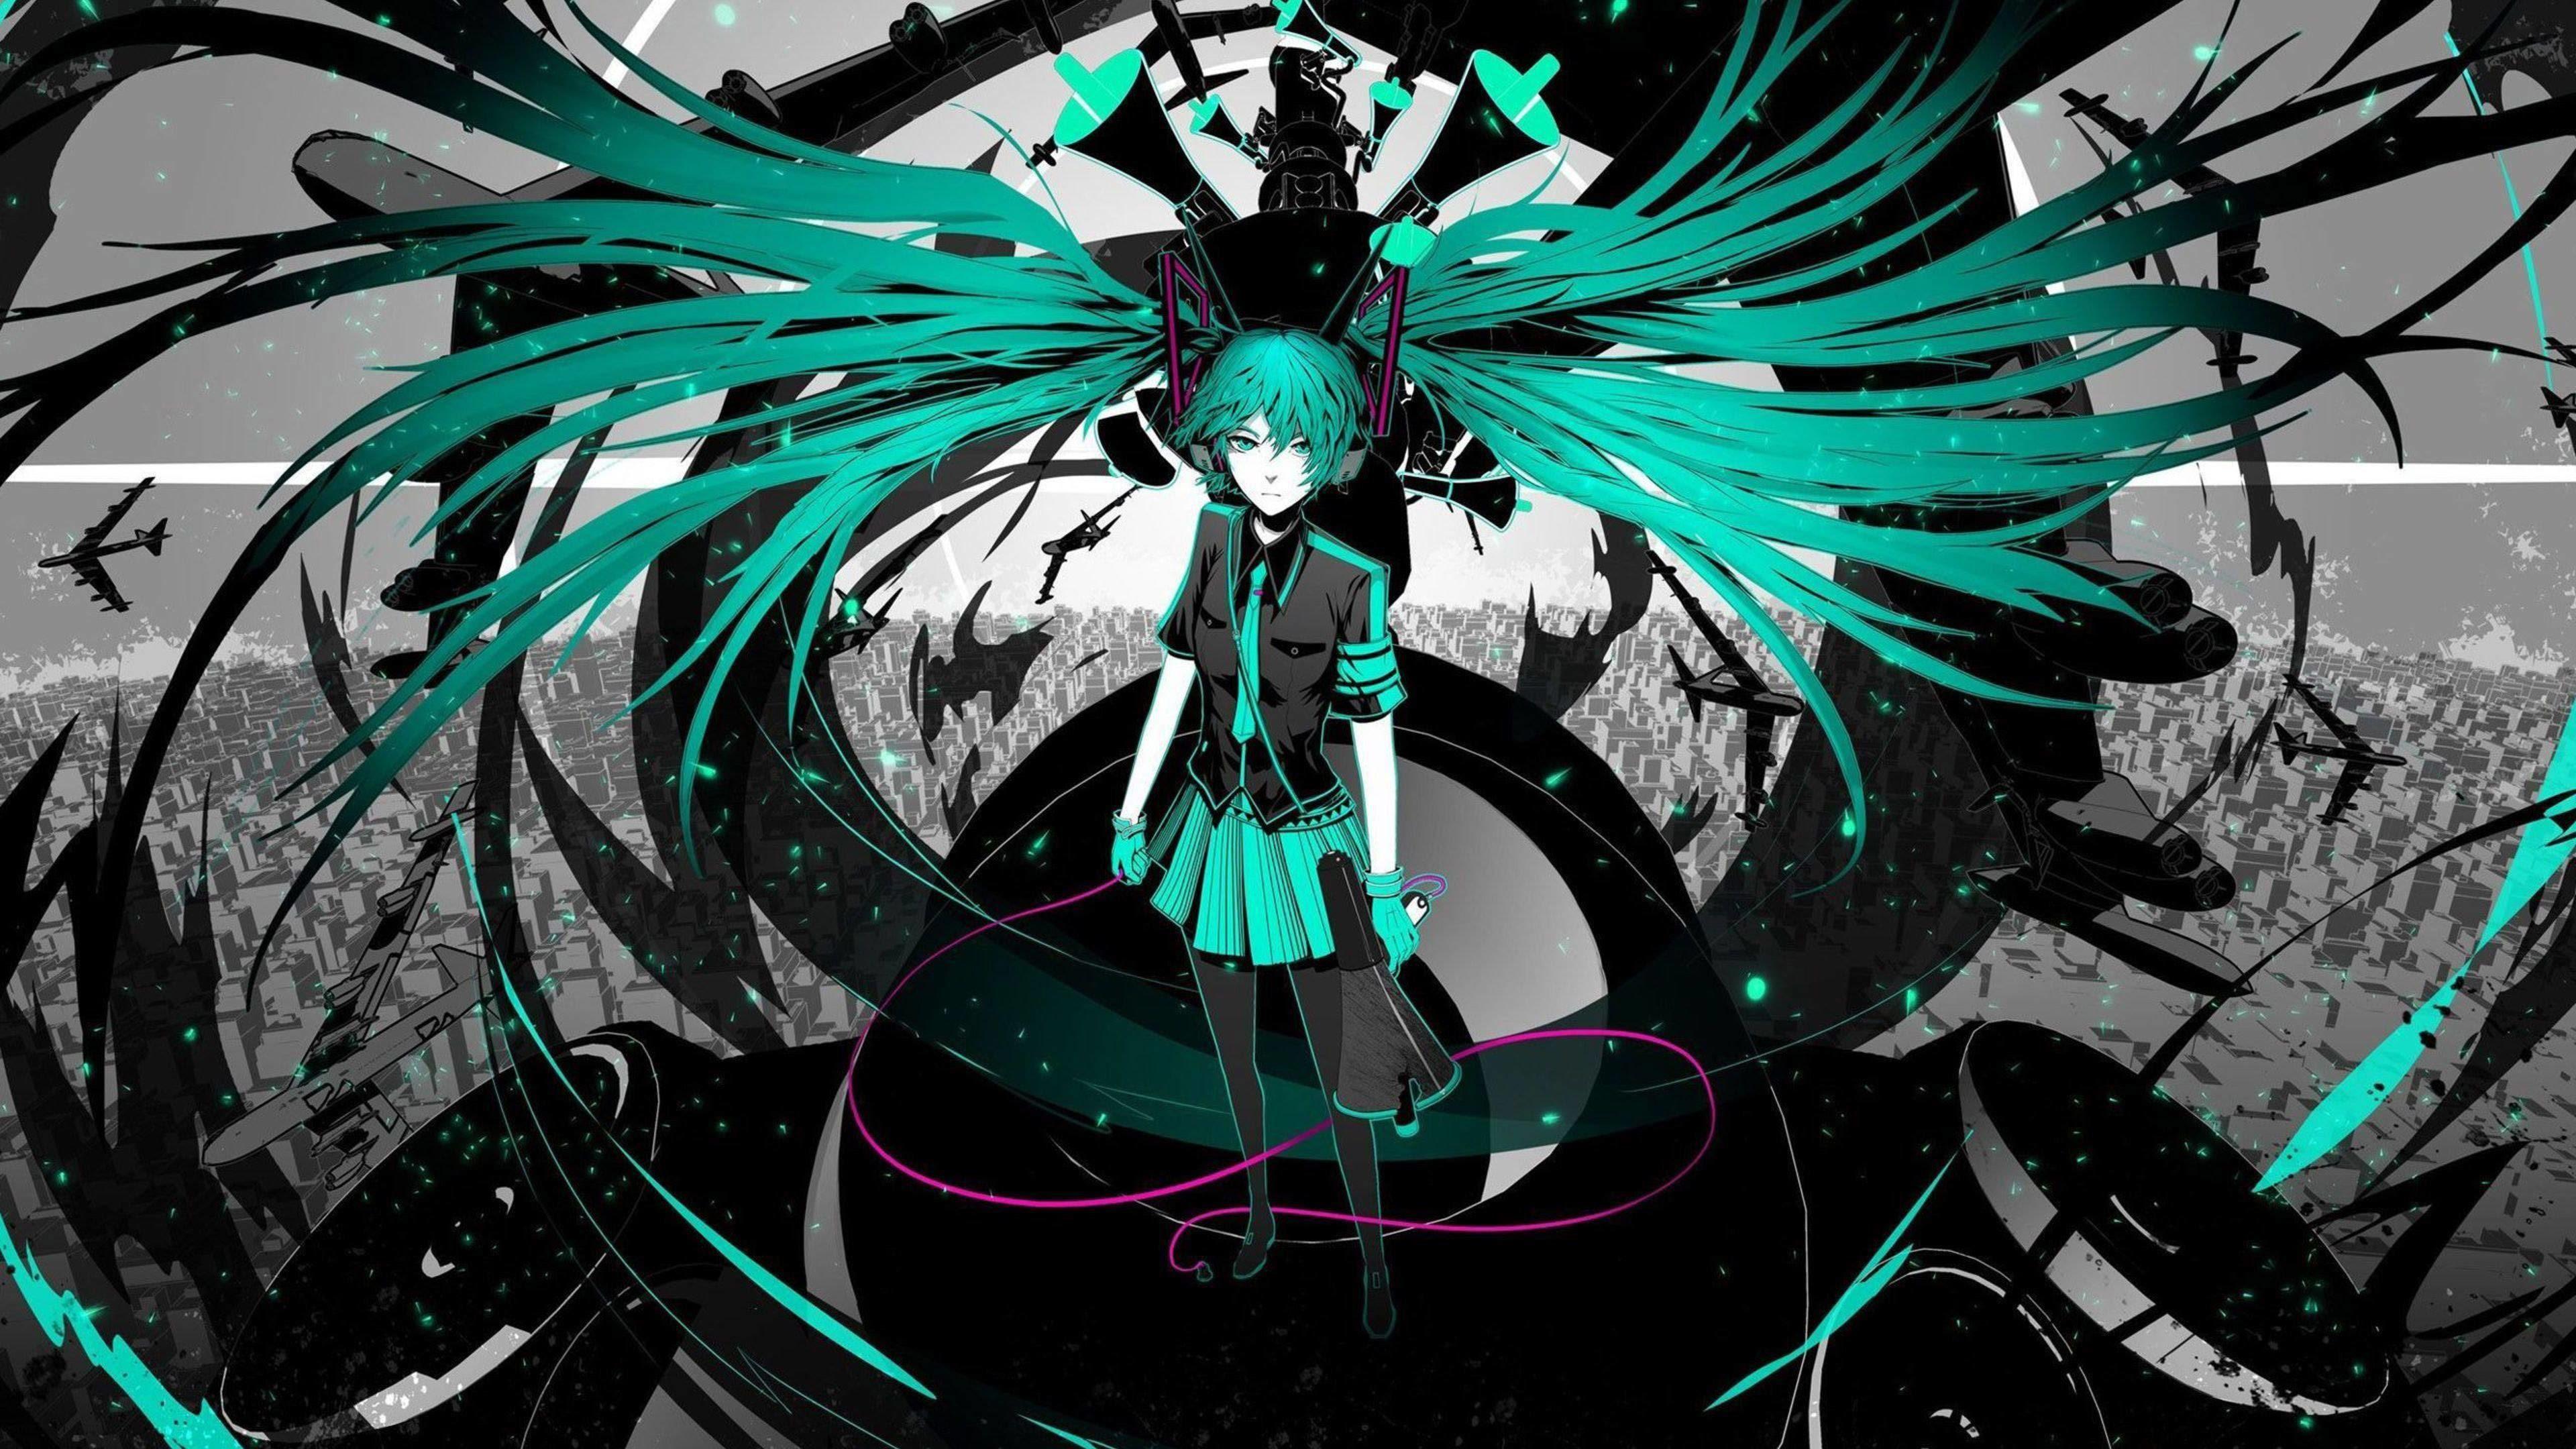 Unduh 76 Wallpaper Hd Anime Hatsune Miku HD Terbaik